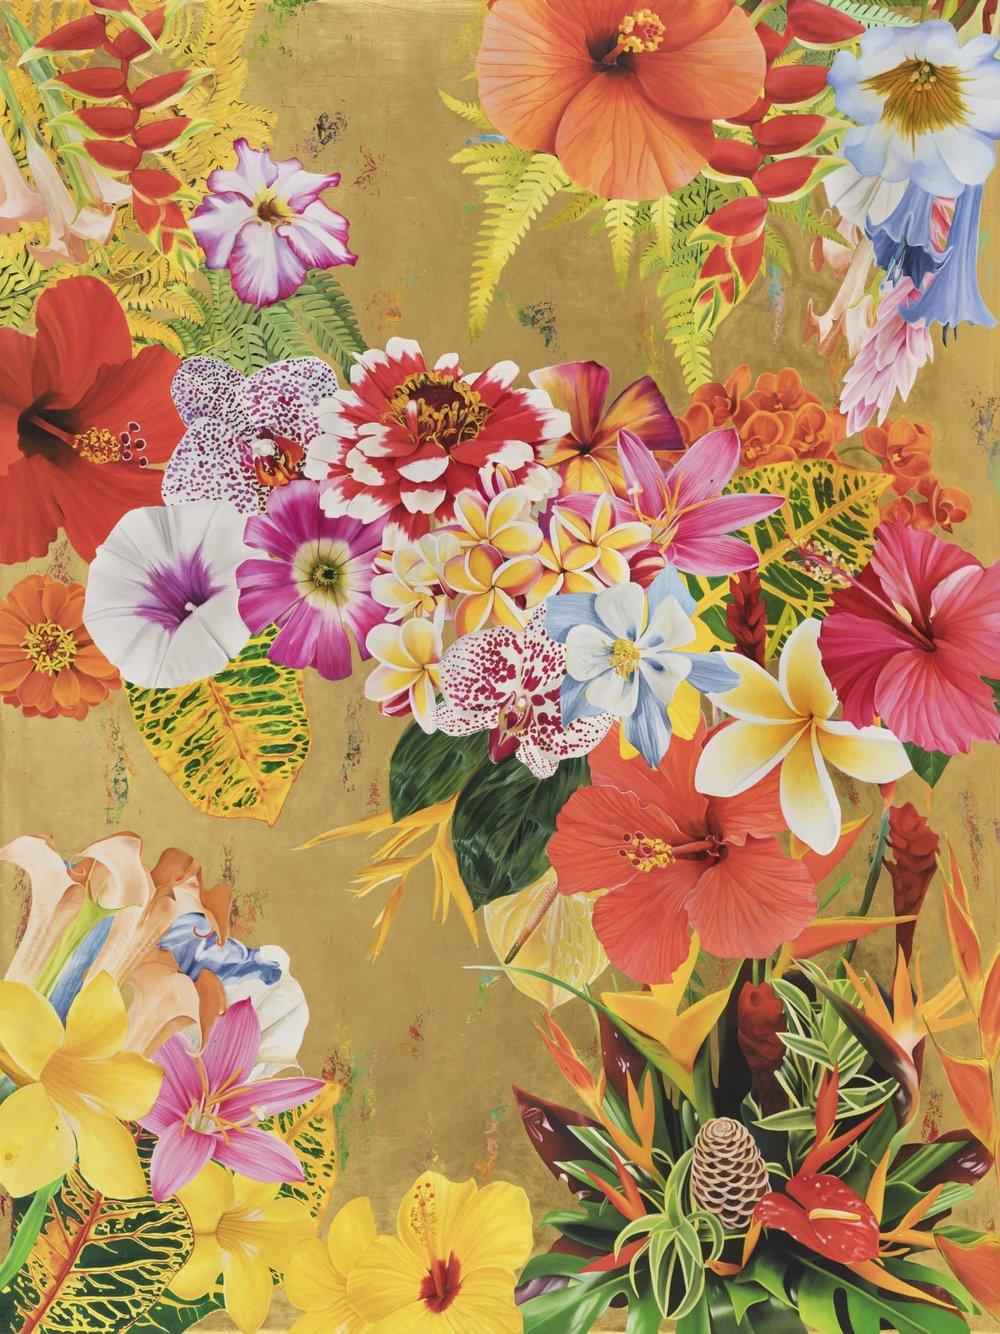 Gild-the-Lily-Decadence-Upon-Decadence-III-2016-1280x1708.jpg